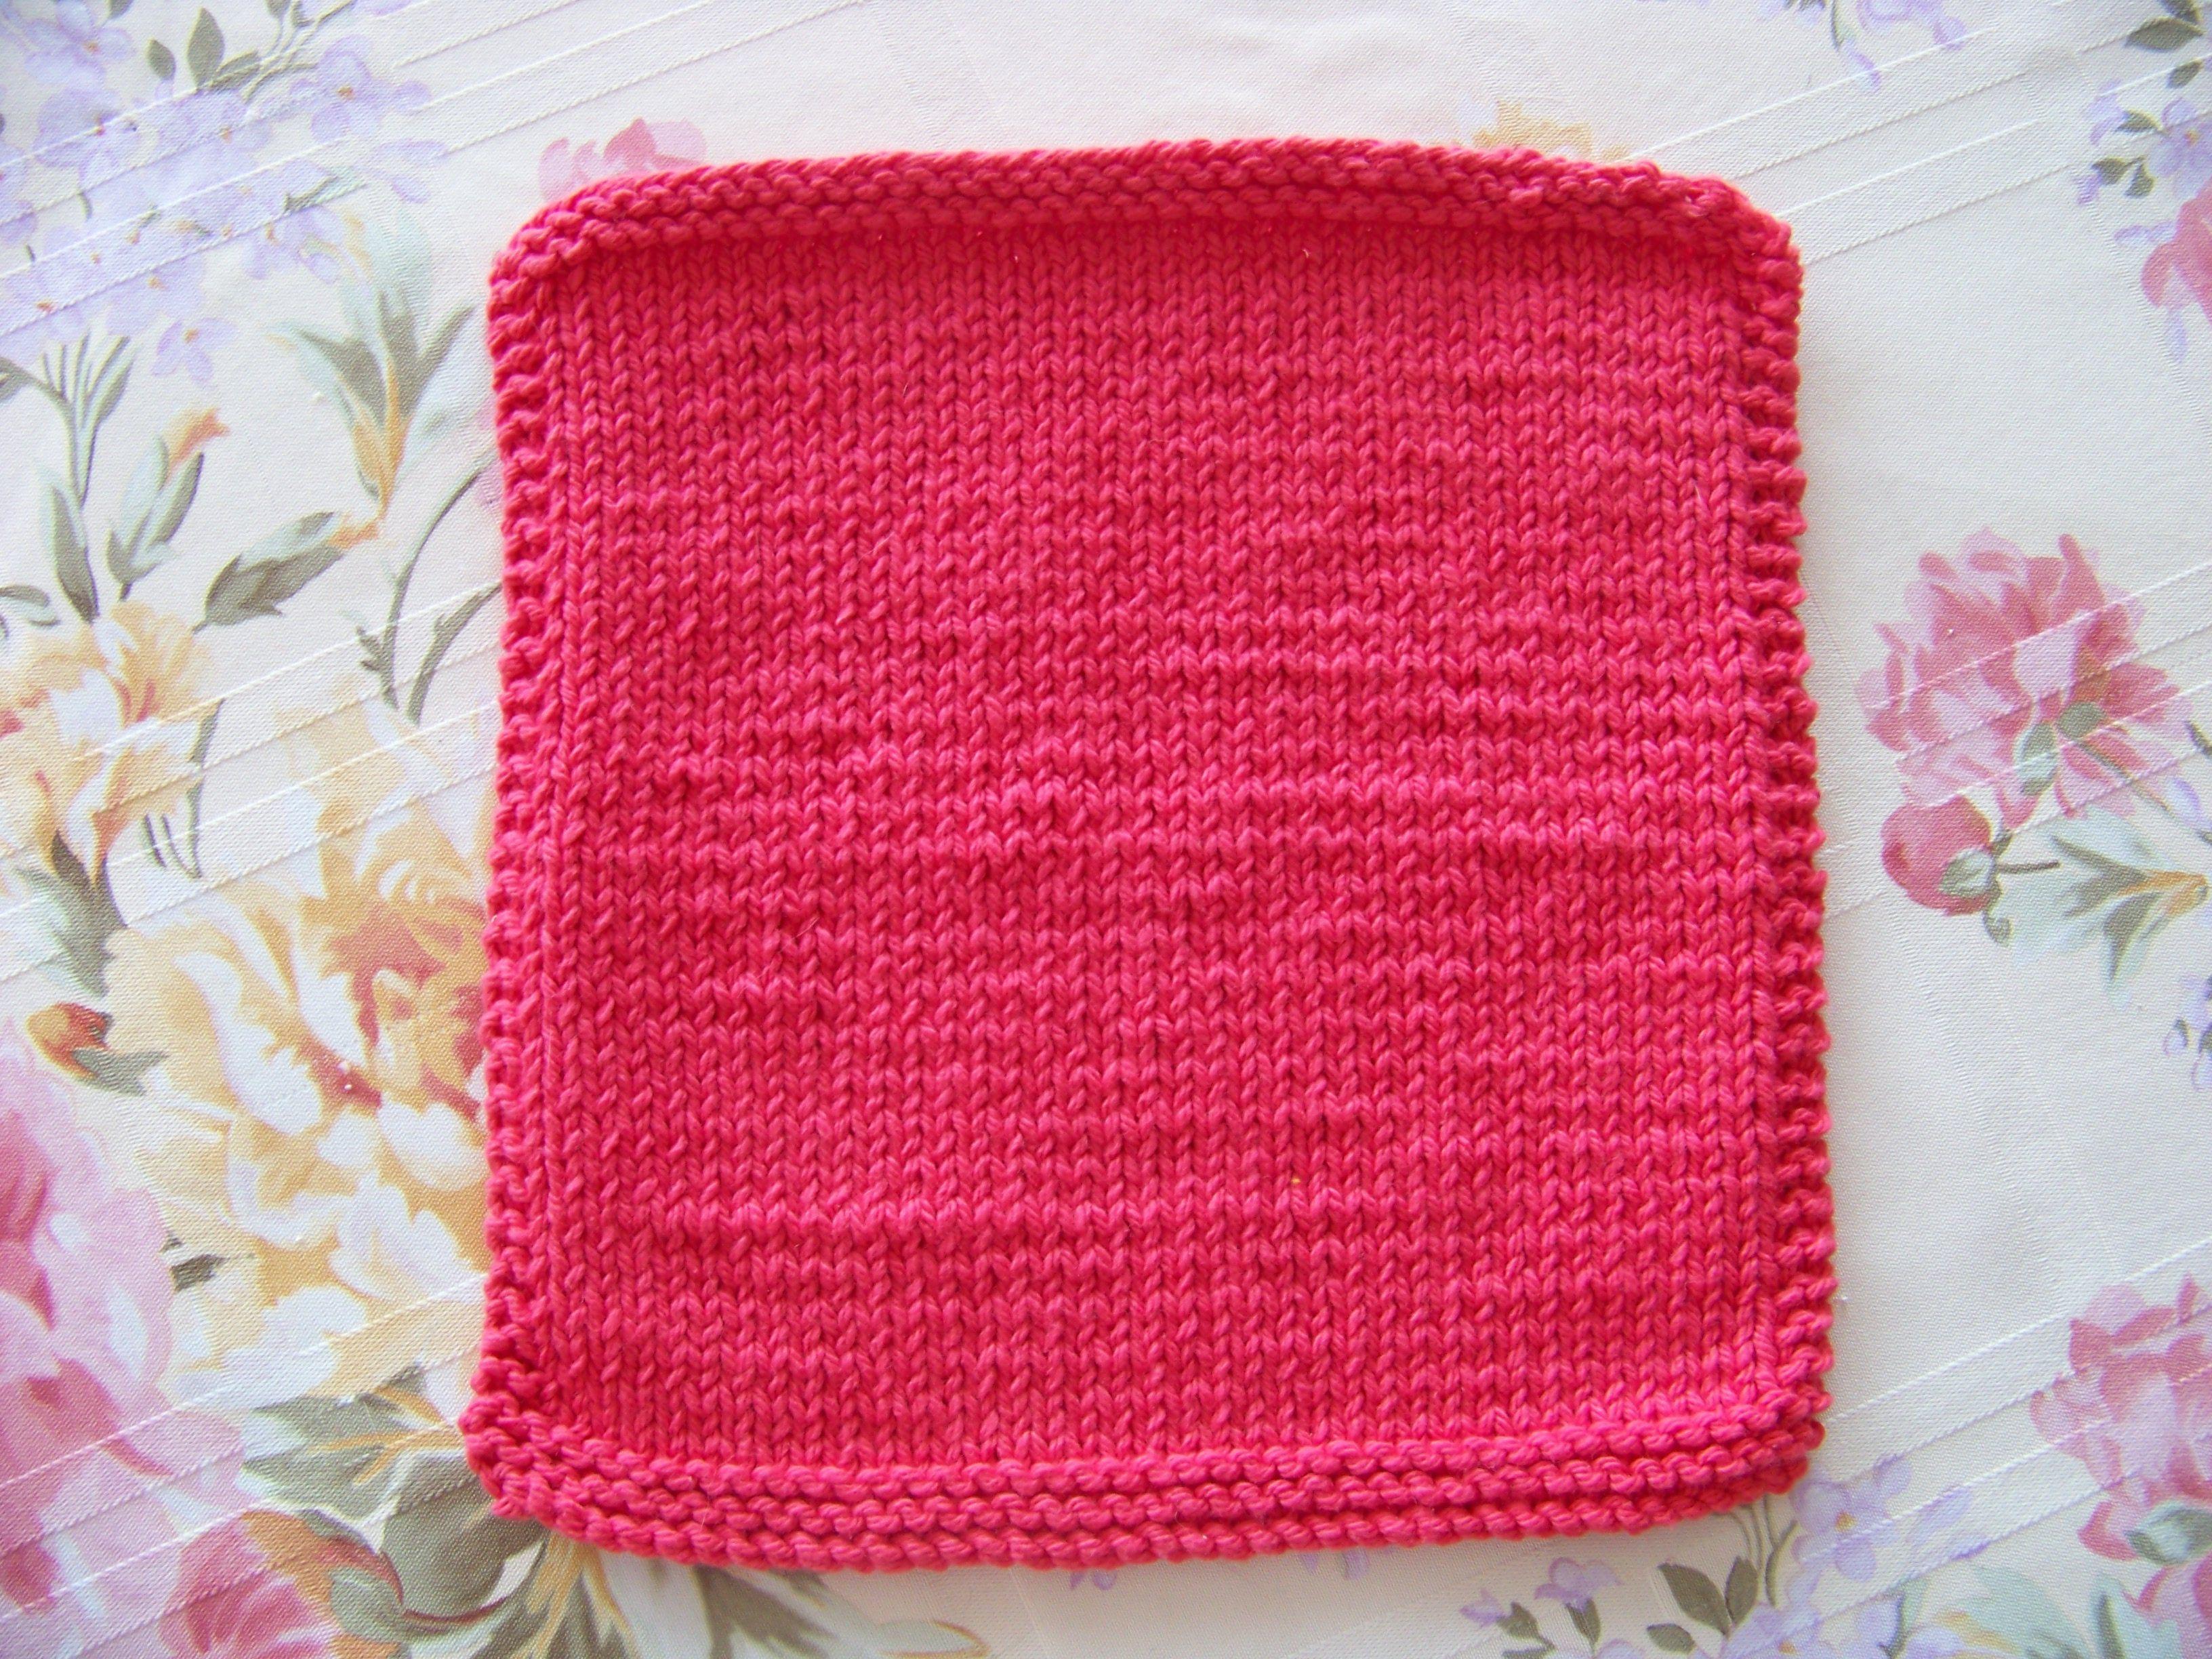 Knitting Bias Stockinette : Stockinette knitted dishcloth ″x ″ size needles co